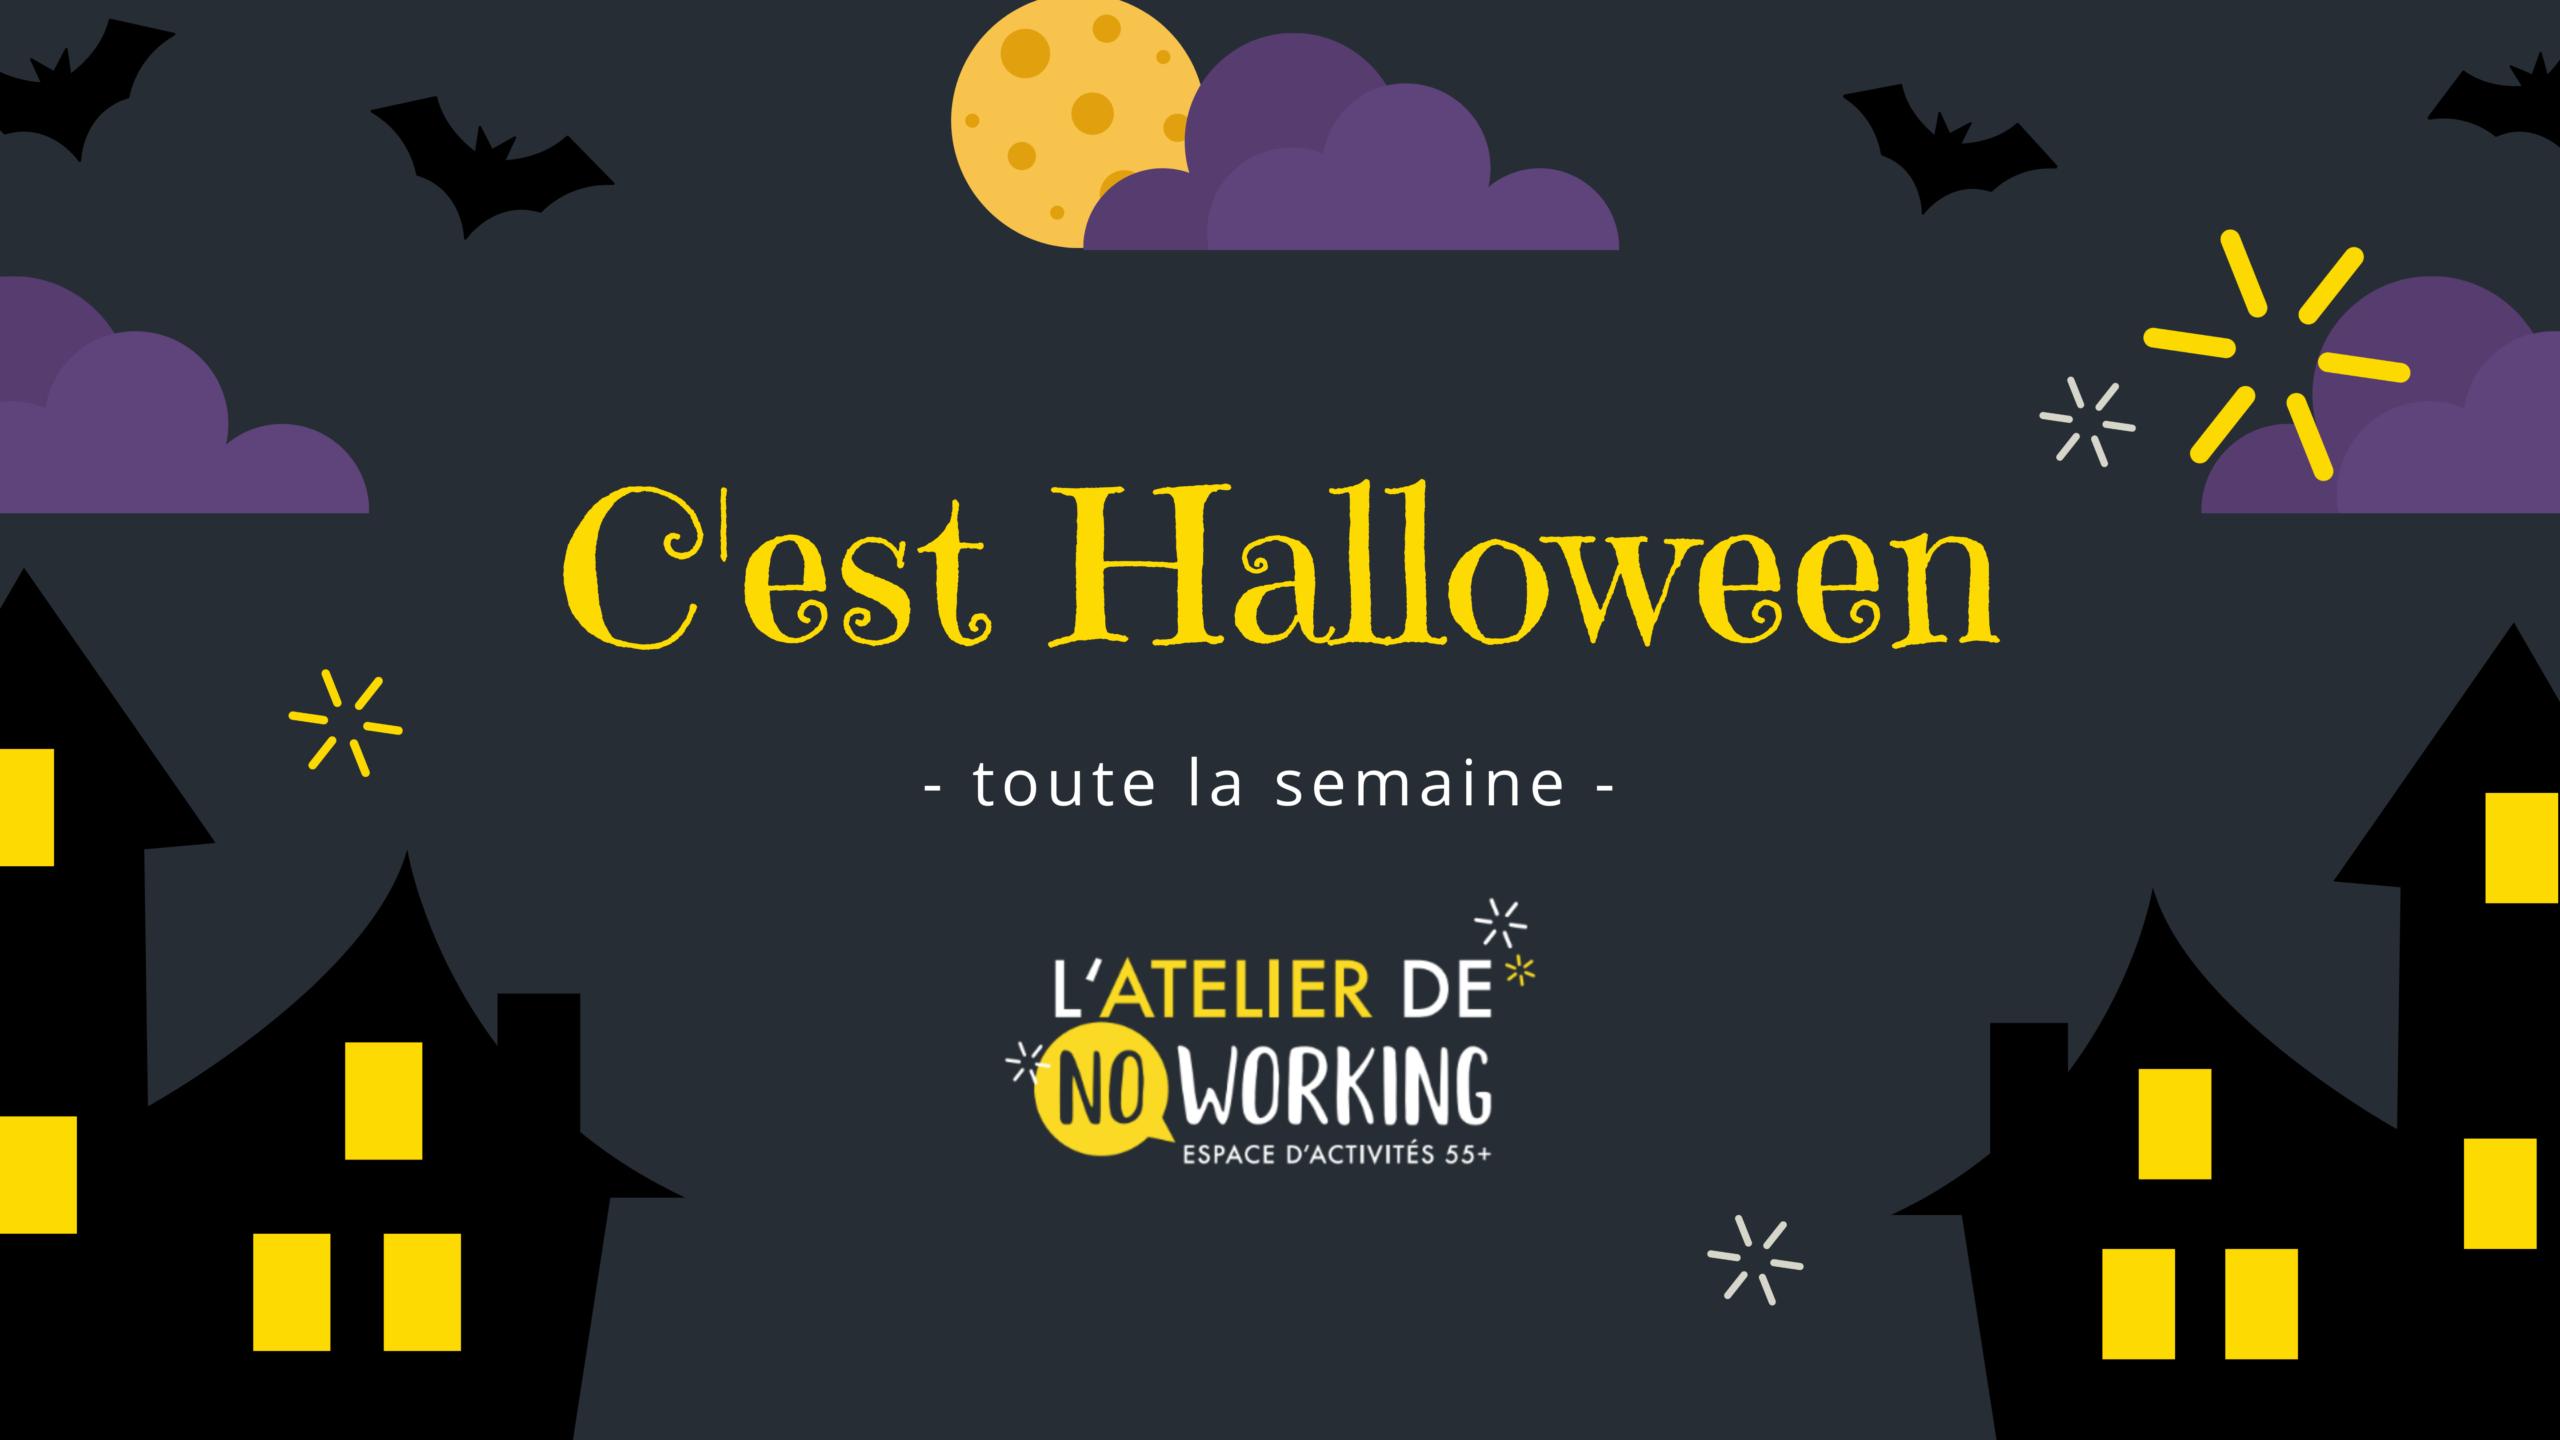 C'est Halloween toute la semaine !